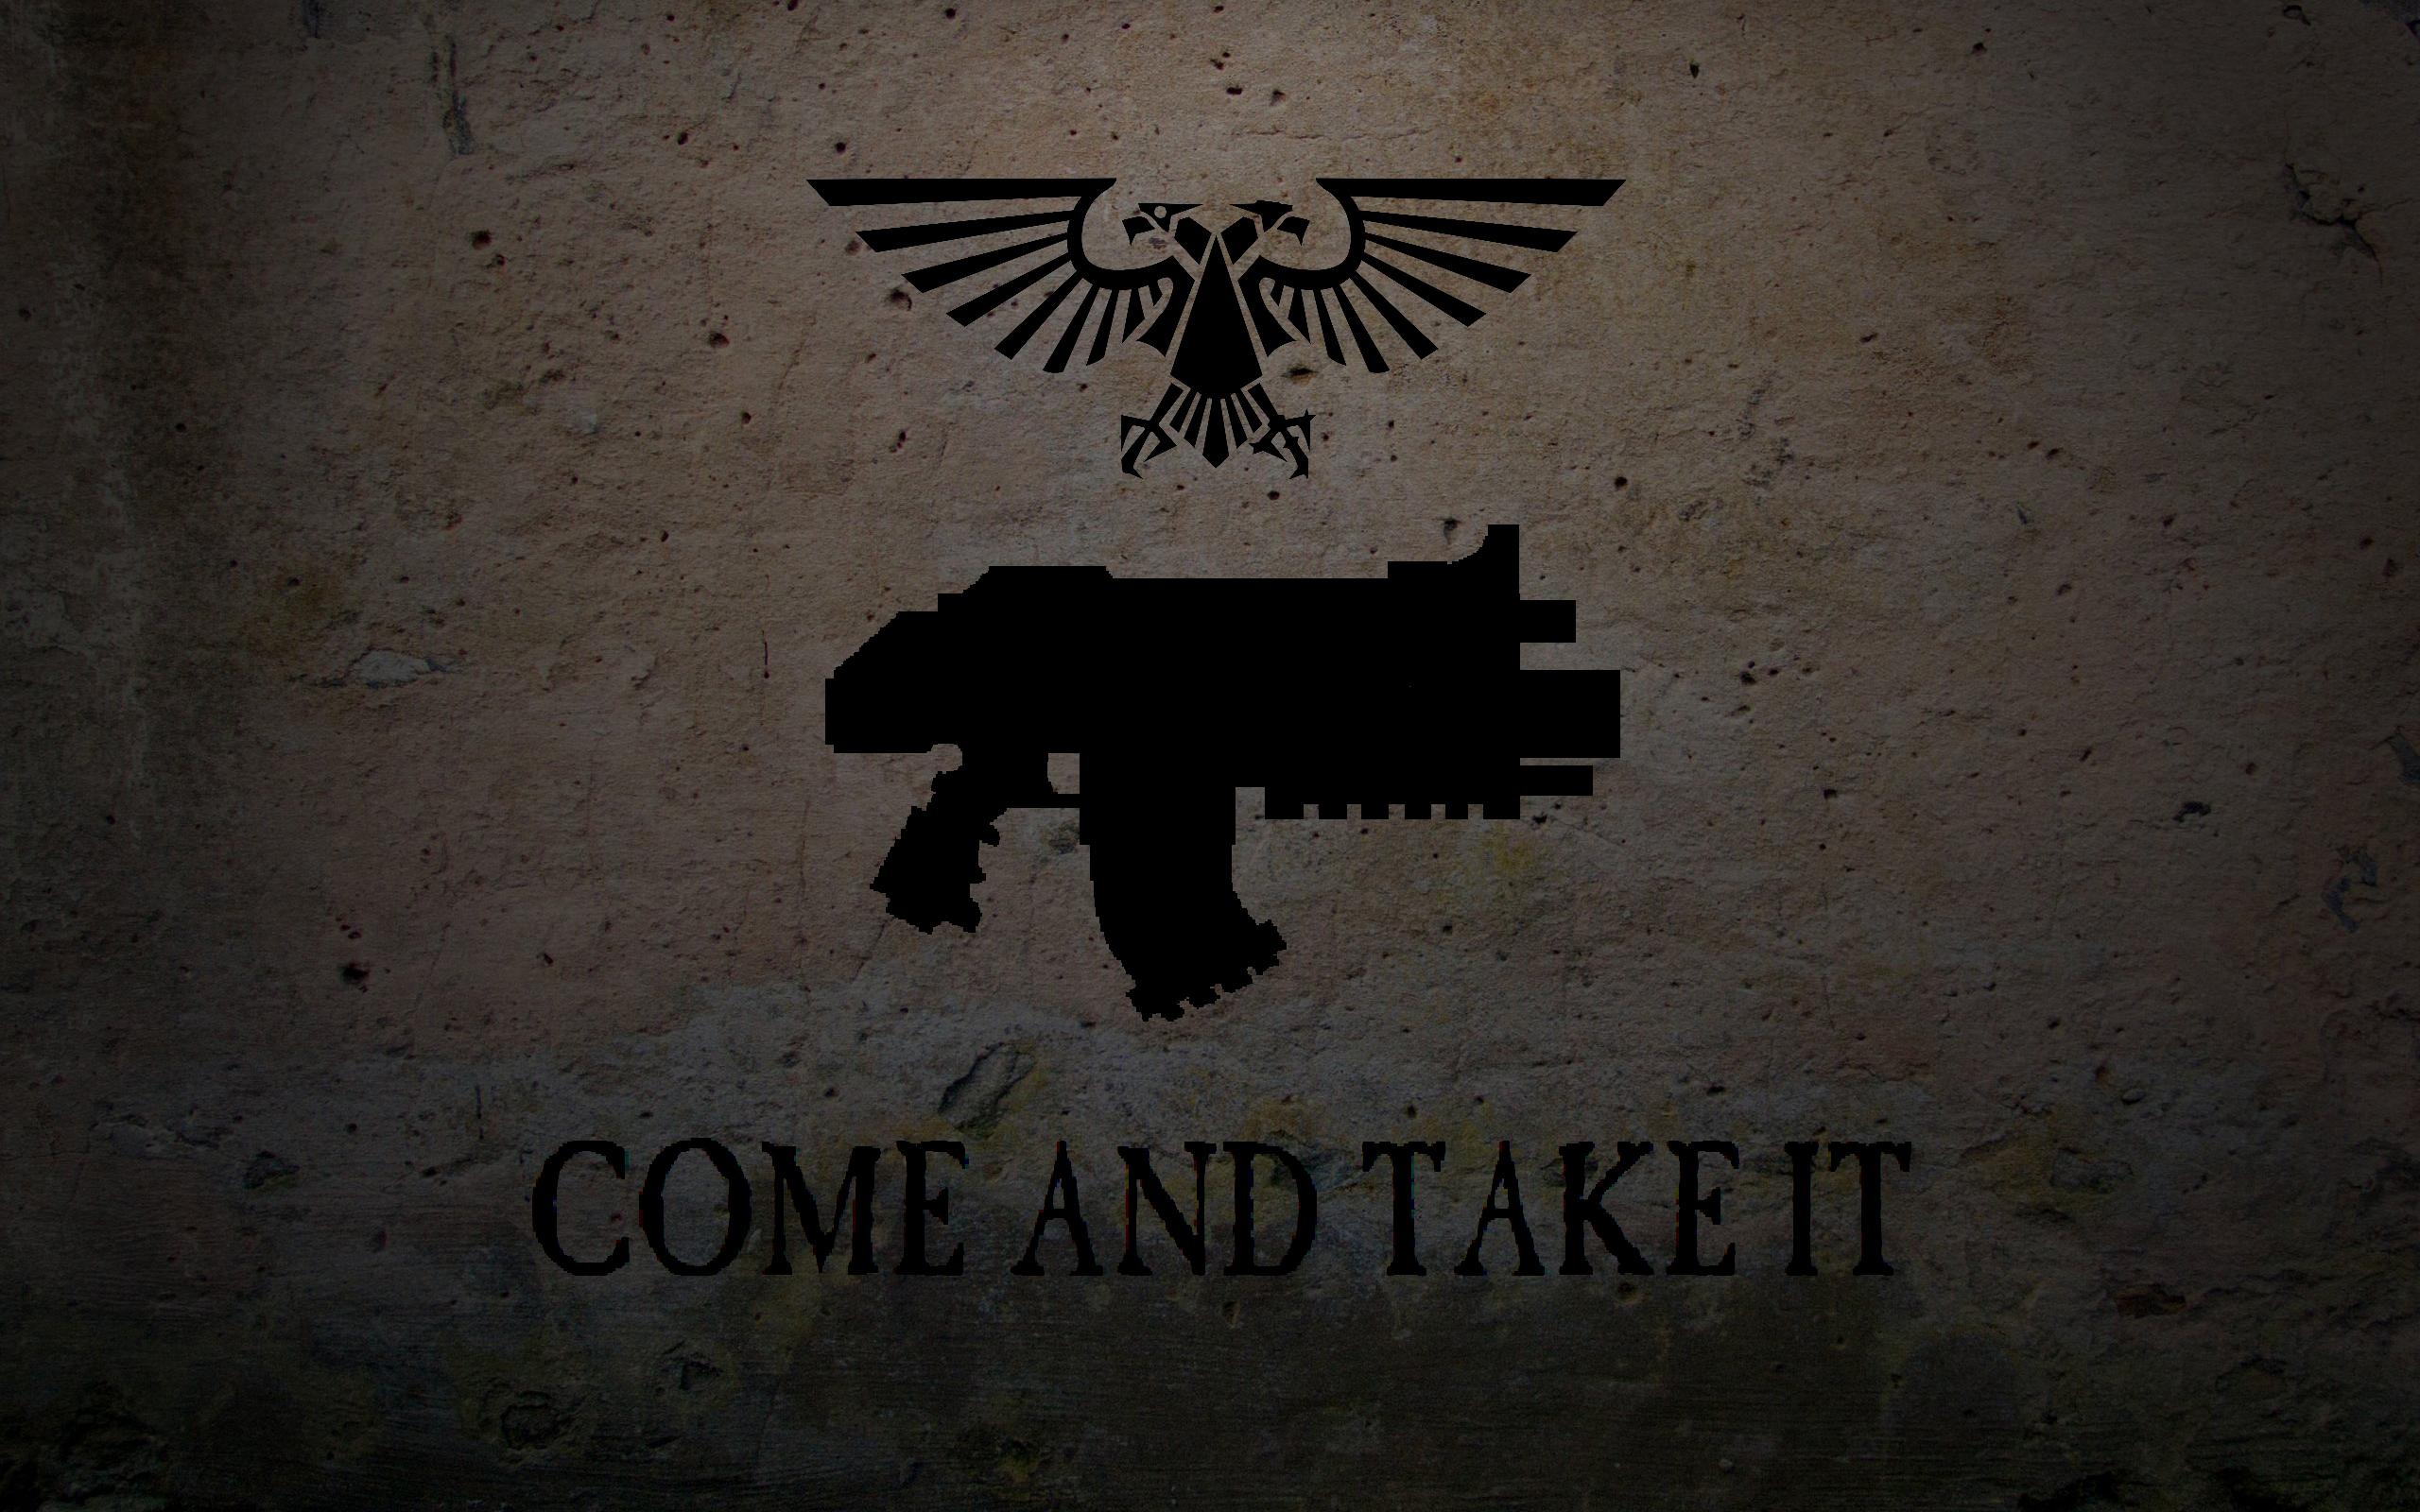 Warhammer Hd Wallpaper Background Image 2560x1600 Id 205241